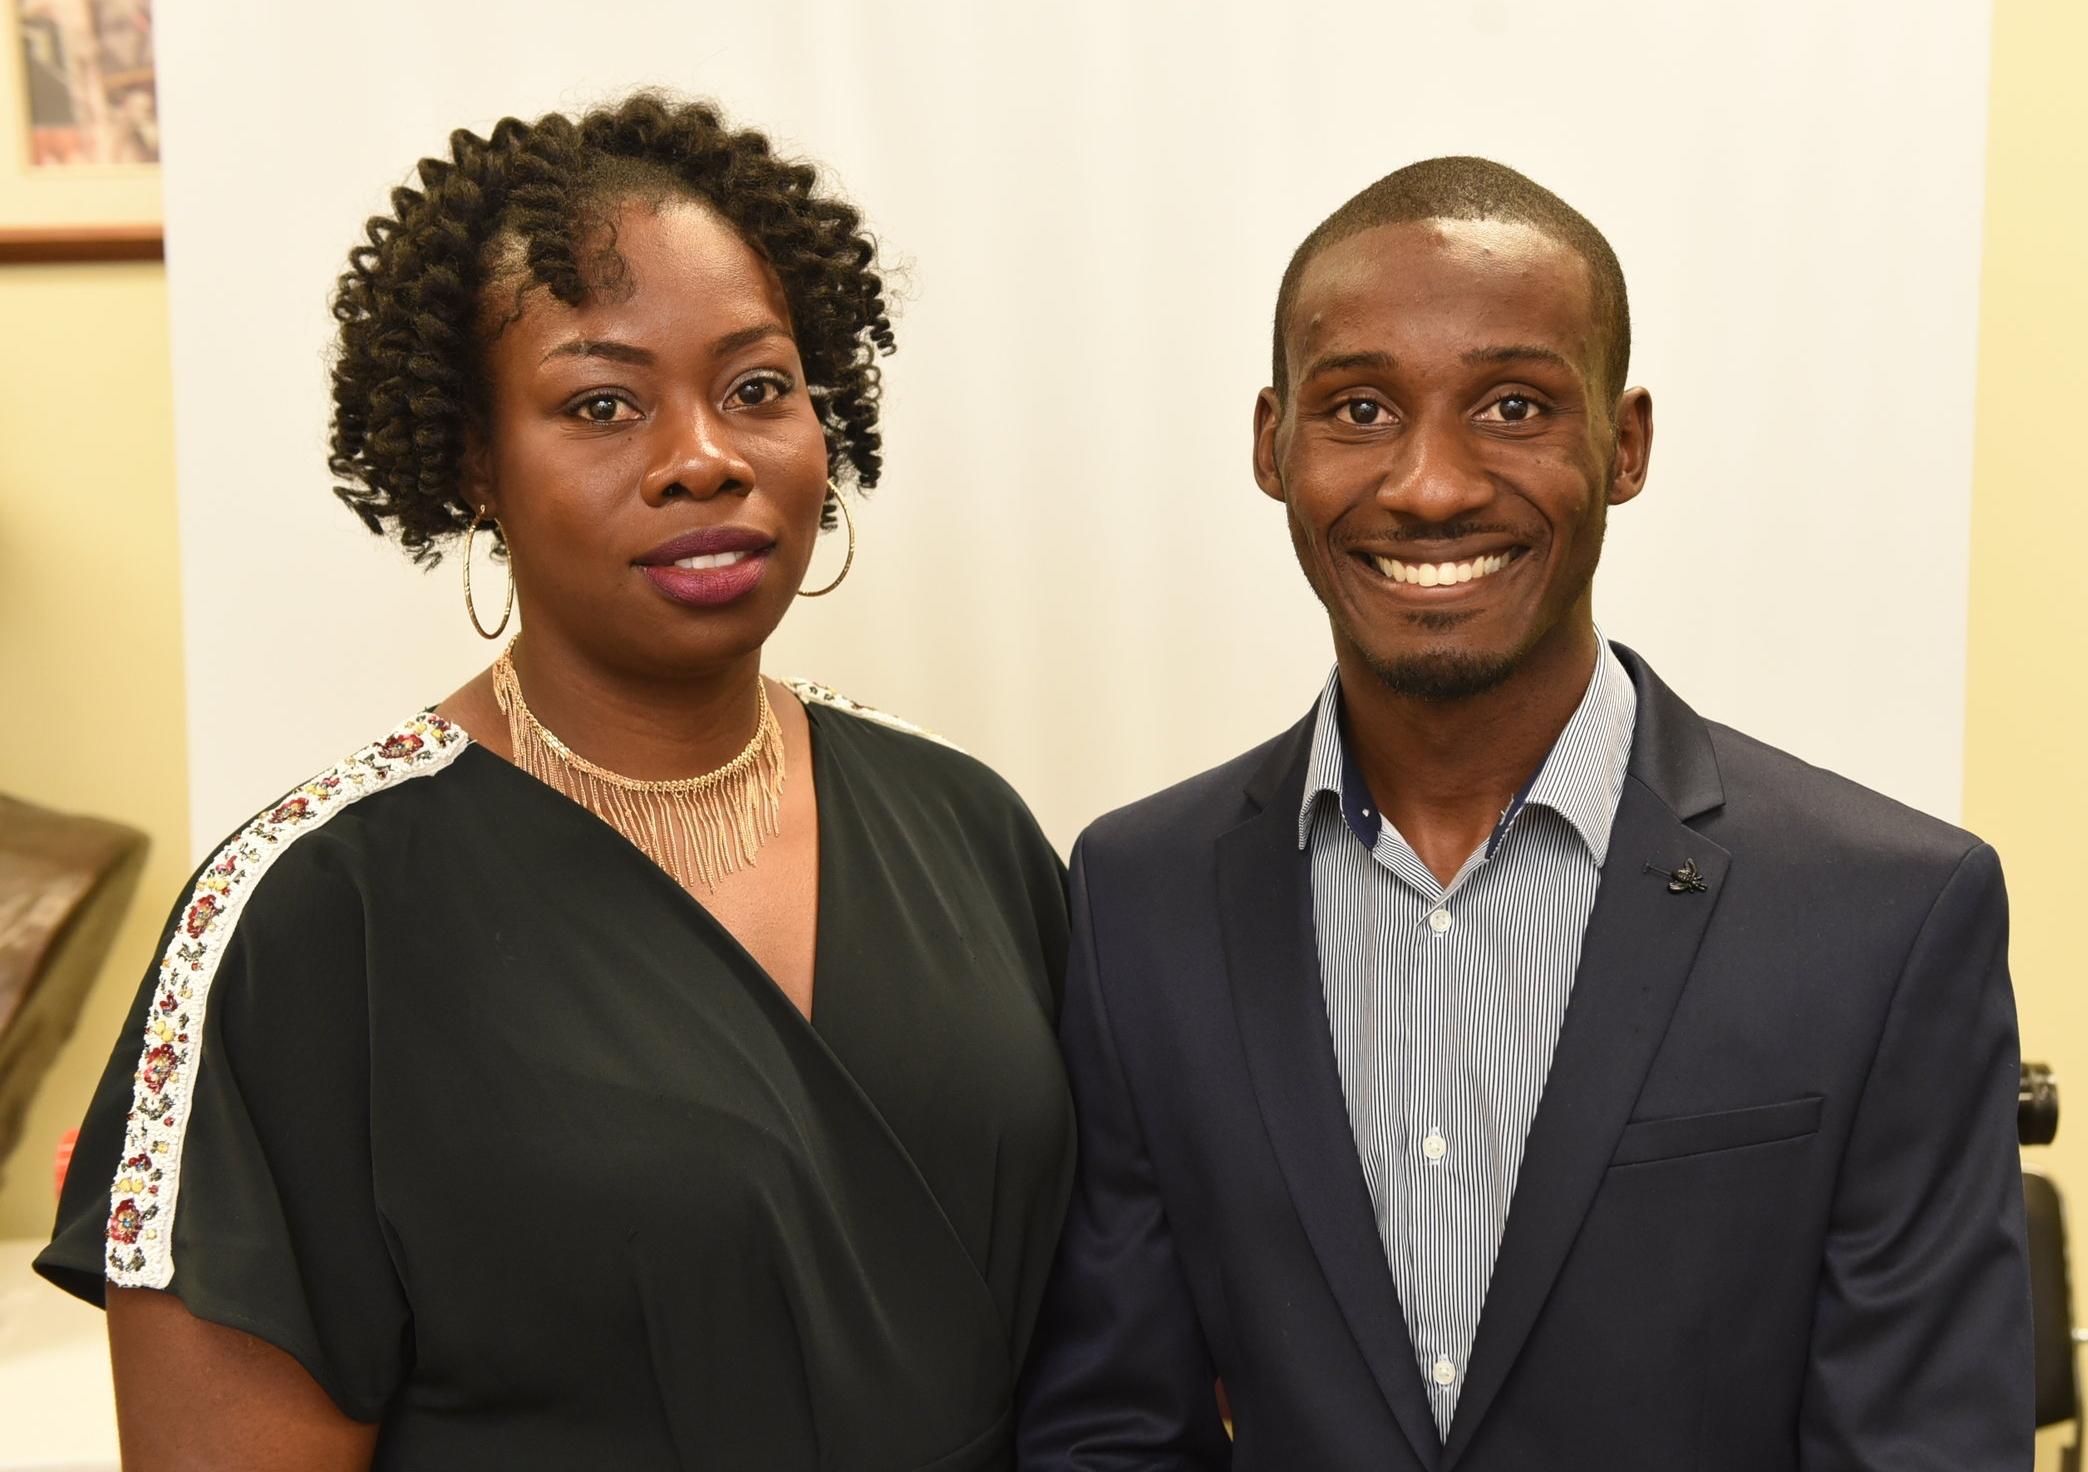 Jamaican international students Tamara Williams and Alvin Henderson